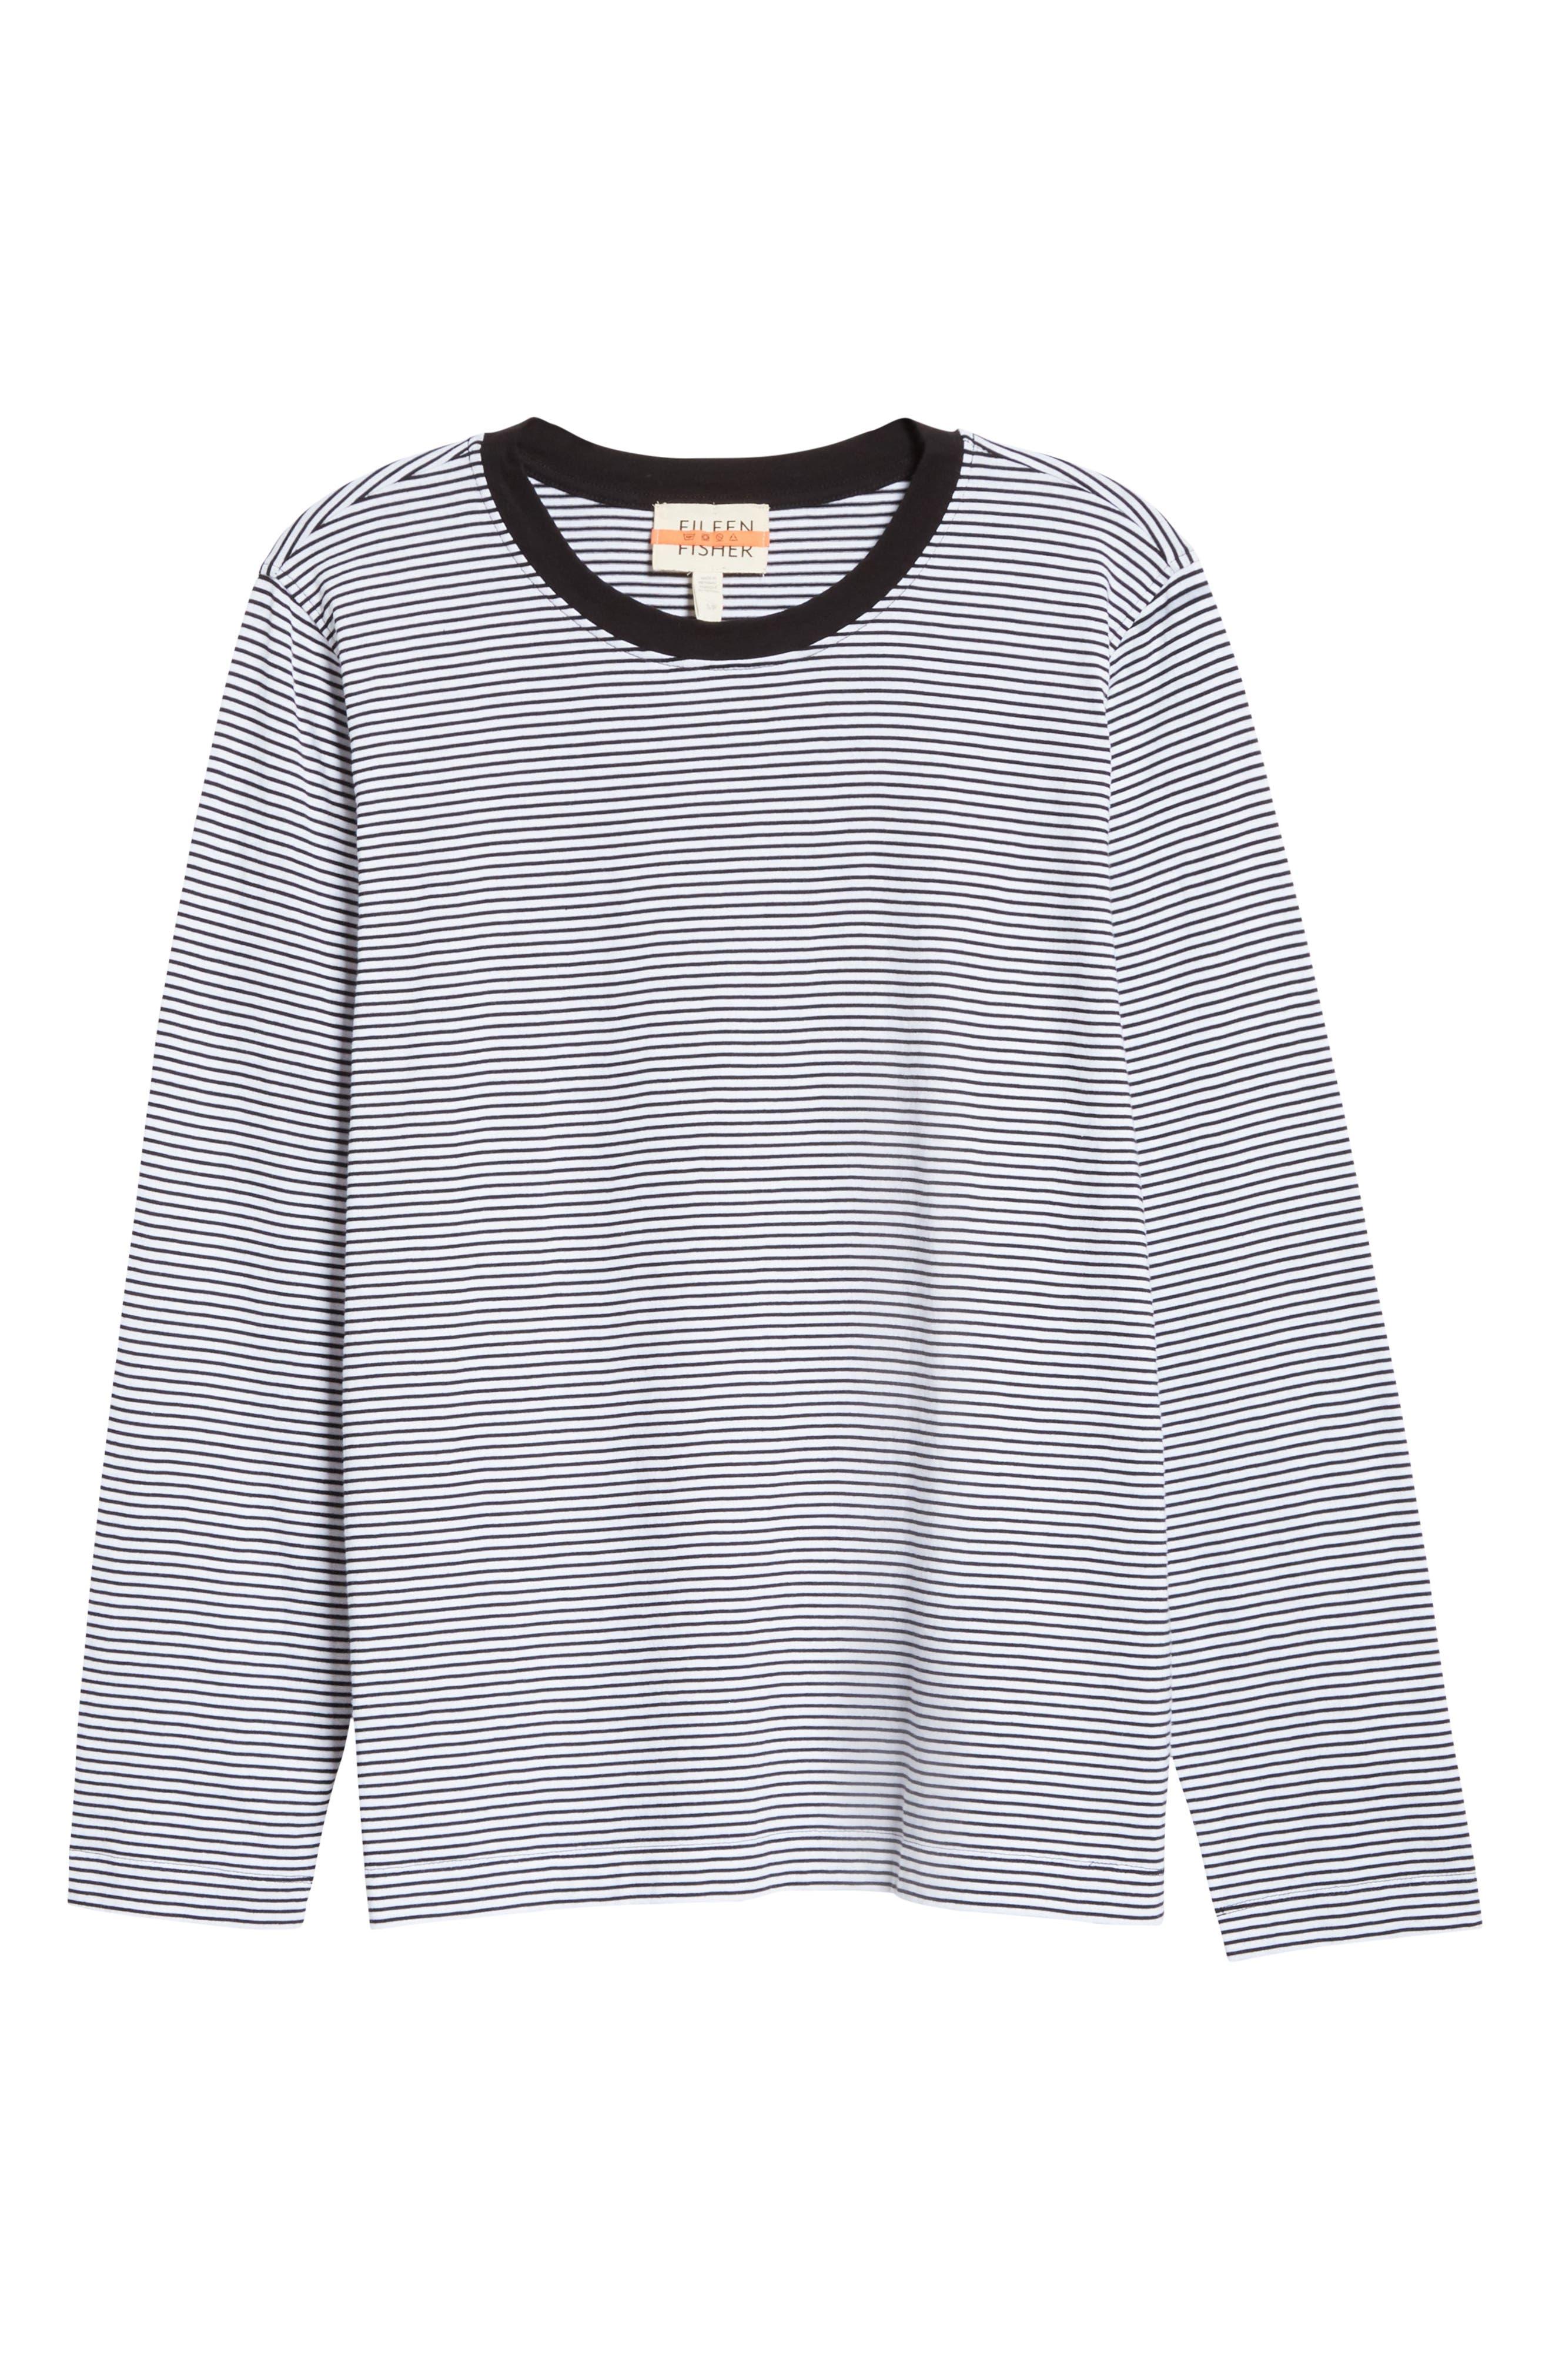 Eileen Fisher White Organic Cotton Henley Cap-Sleeve Top Tee  Plus Size 1X 2X